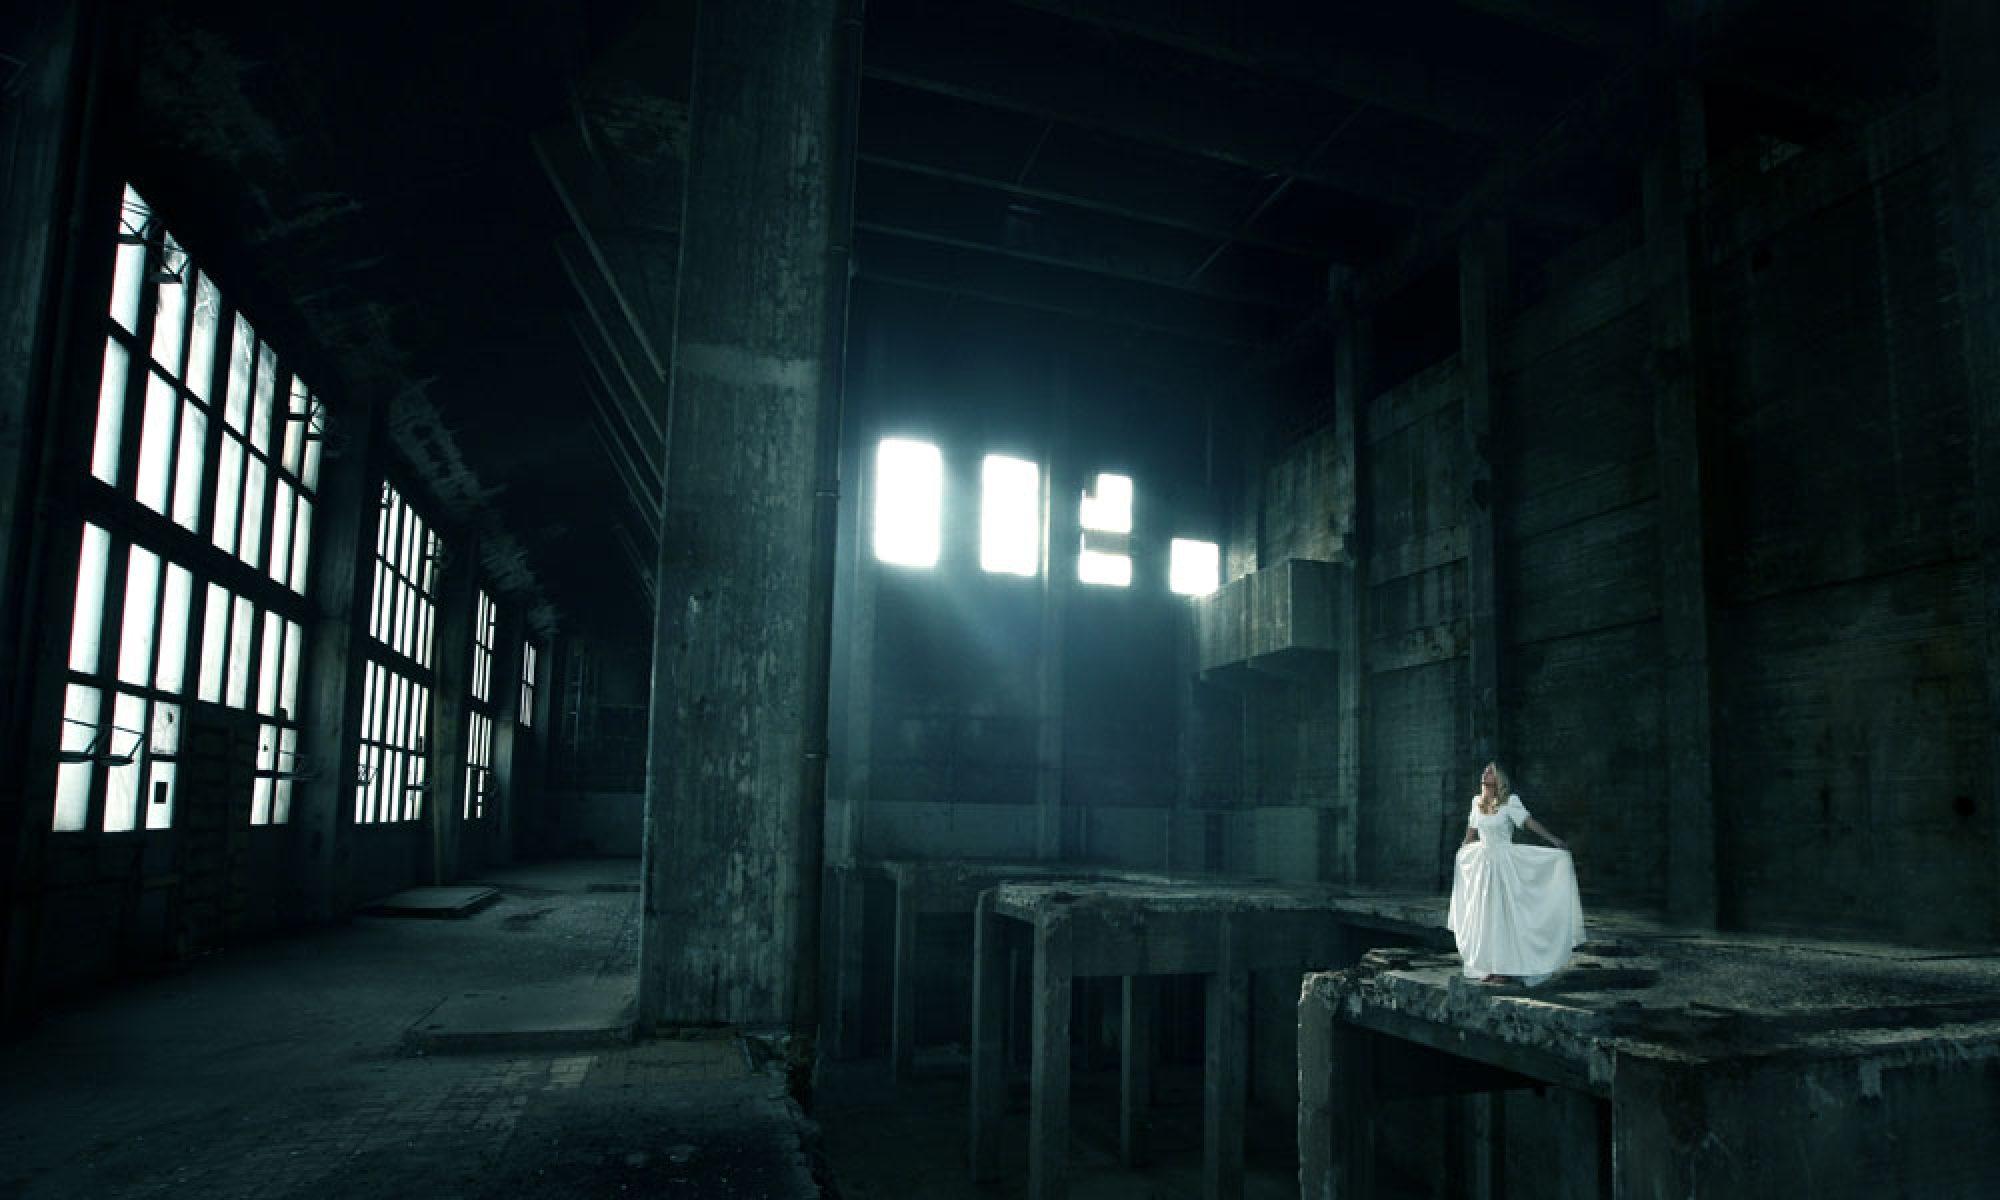 Photographer - Rene Asmussen